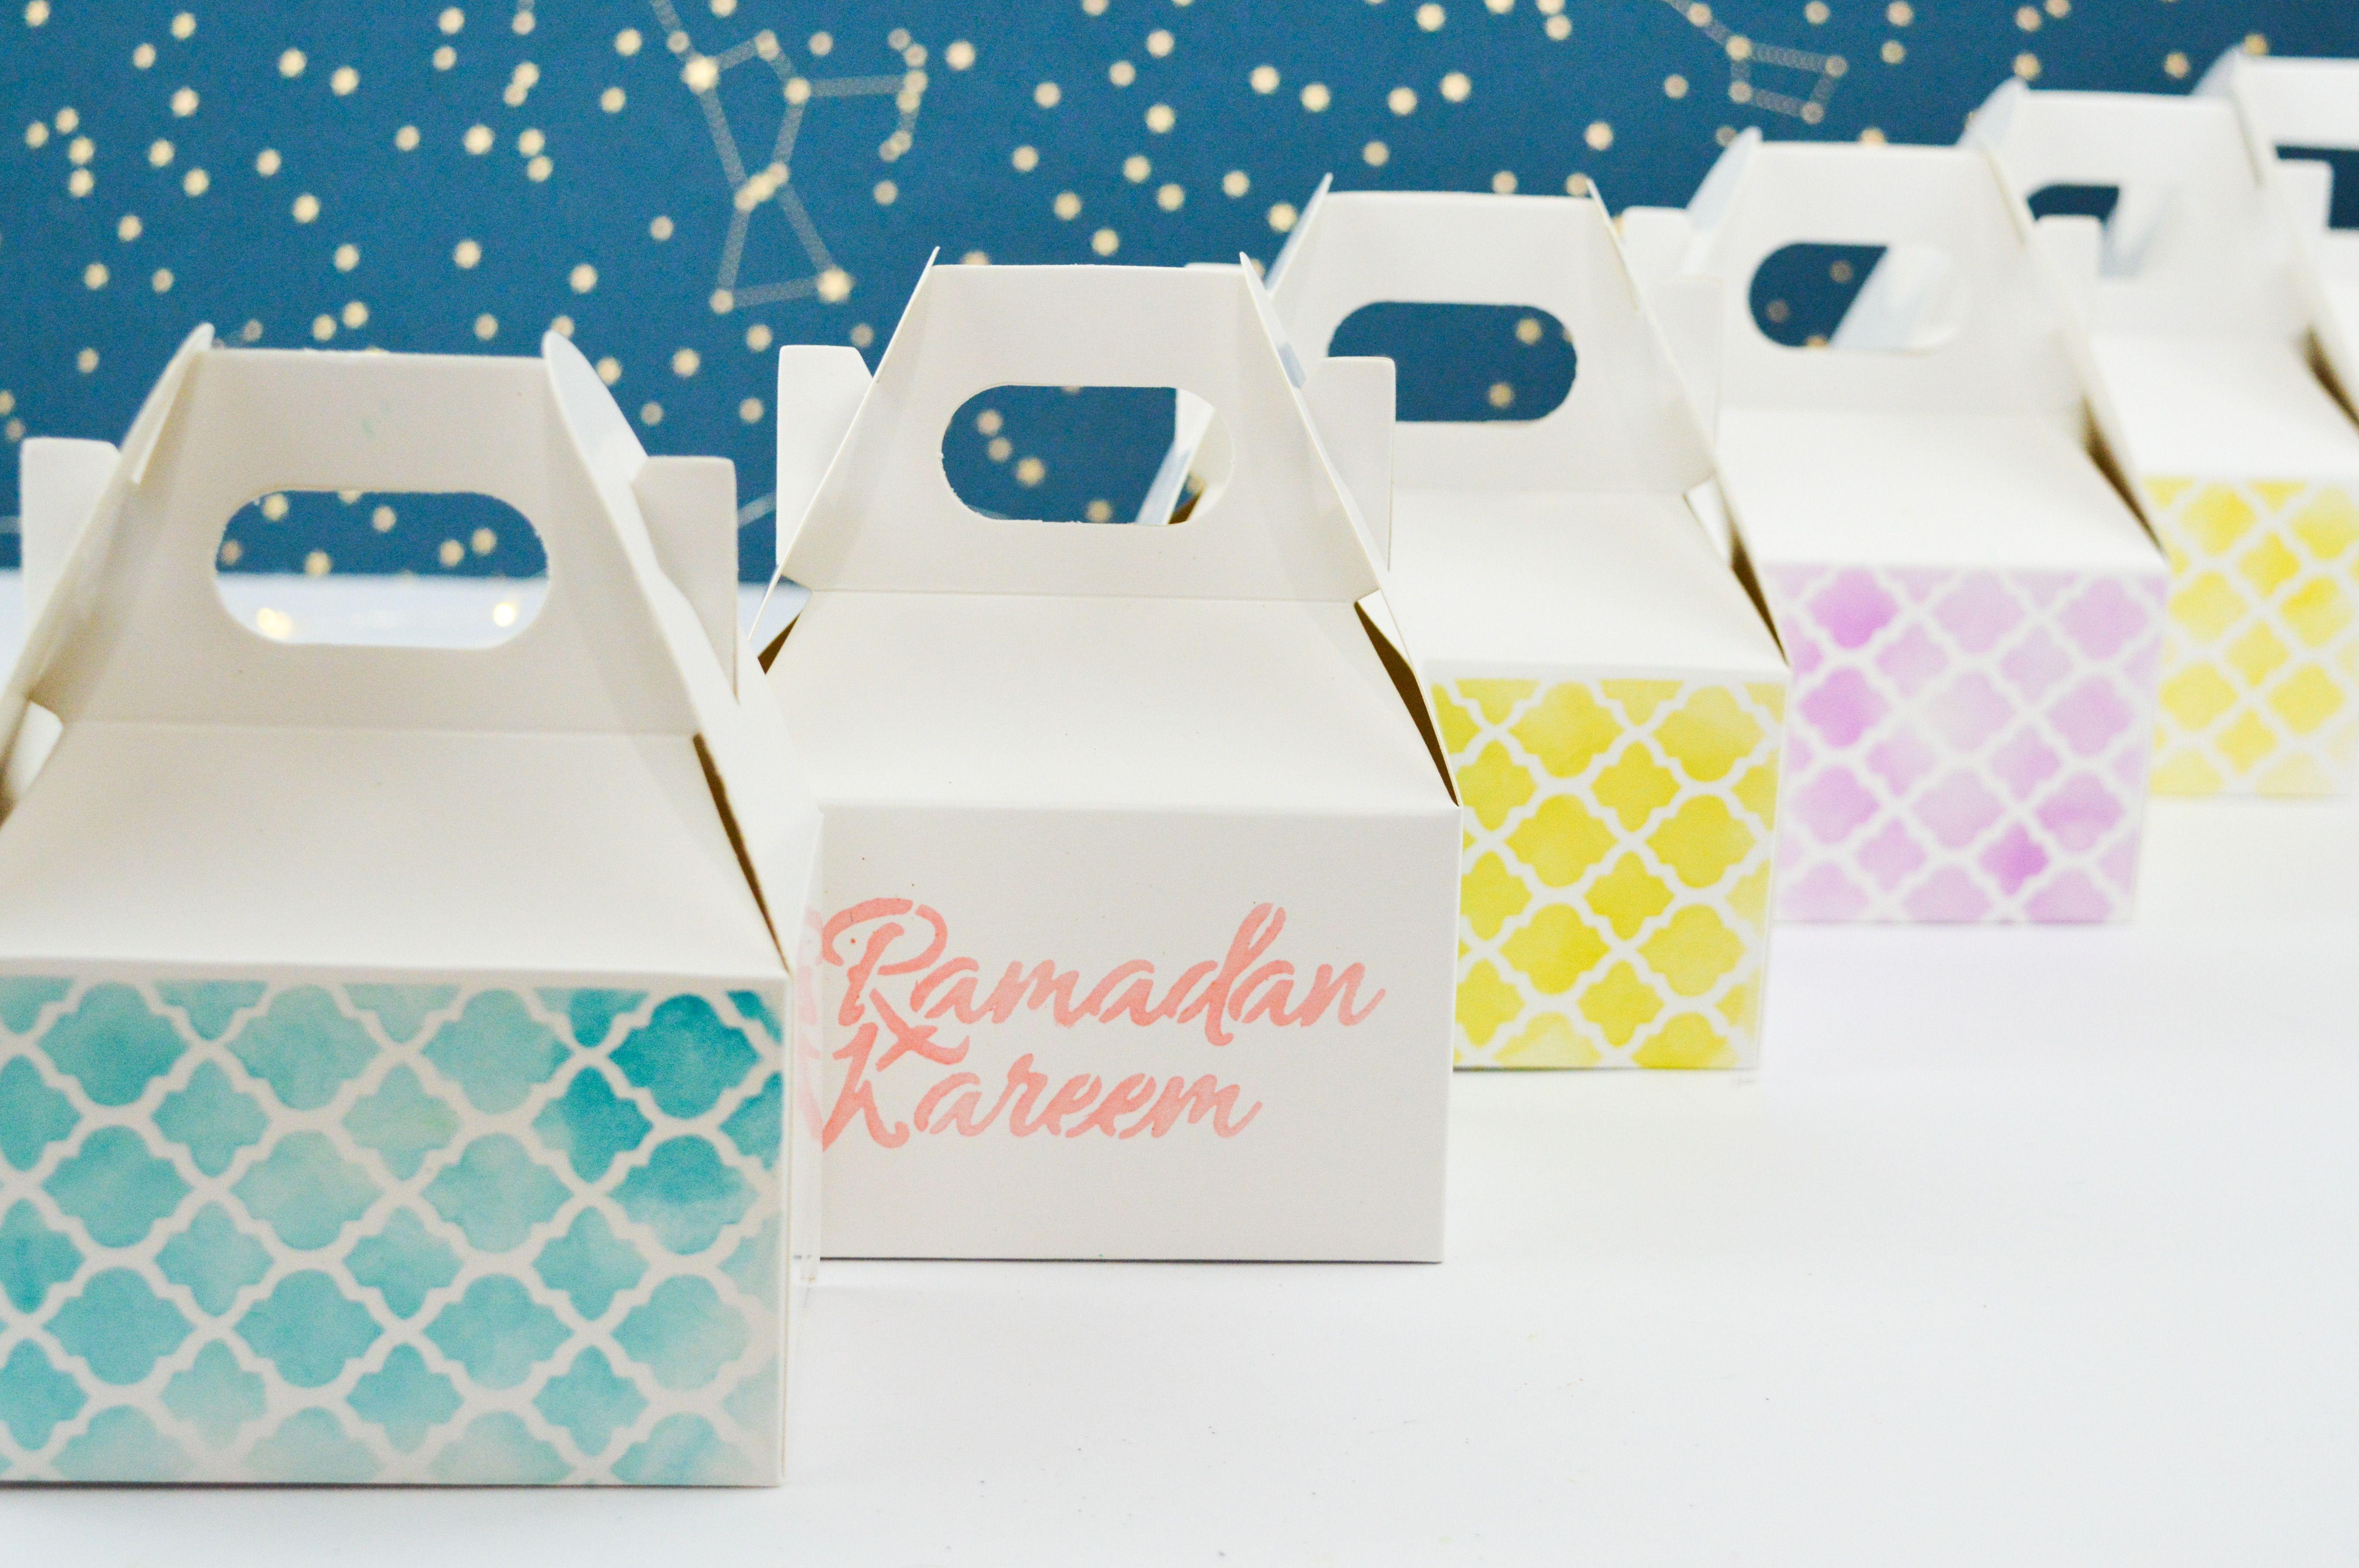 Diy Ramadan Gift Boxes Diy Gift Box Ramadan Gifts Personalised Box